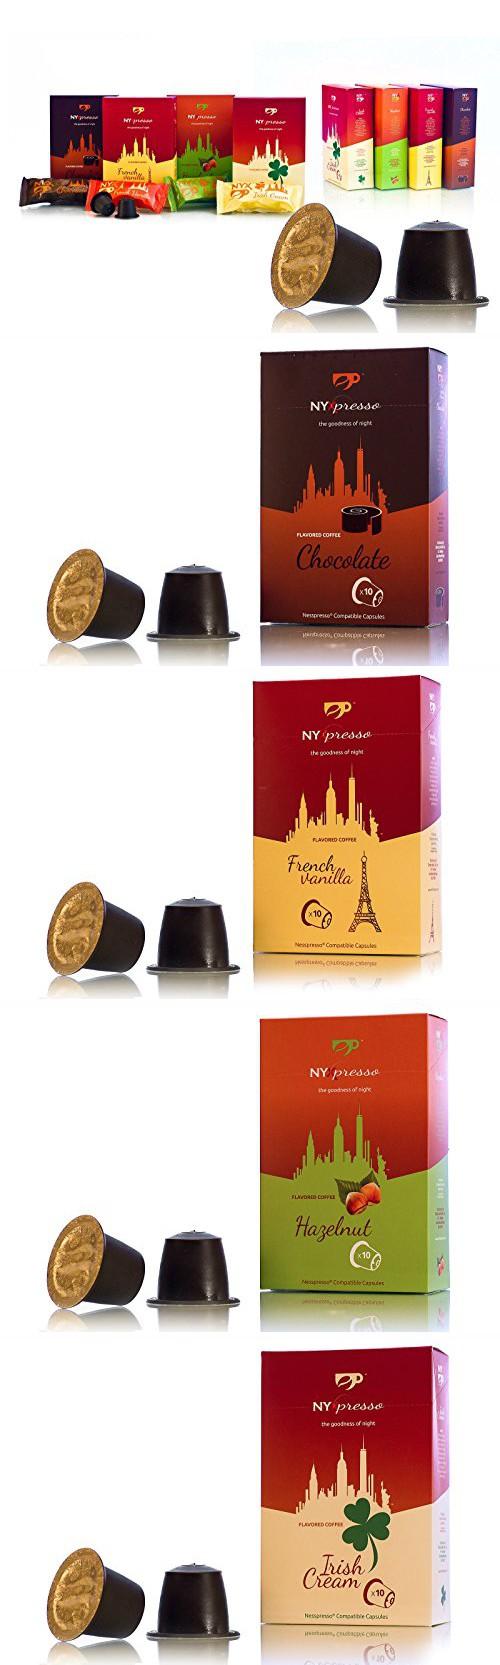 Nyxpresso Variety Pack Irish Cream Huzelnut Franch Vanilla Chocolate Nespresso Compatible Capsules 80 Pods Blended Coffee Irish Cream Fresh Ground Coffee